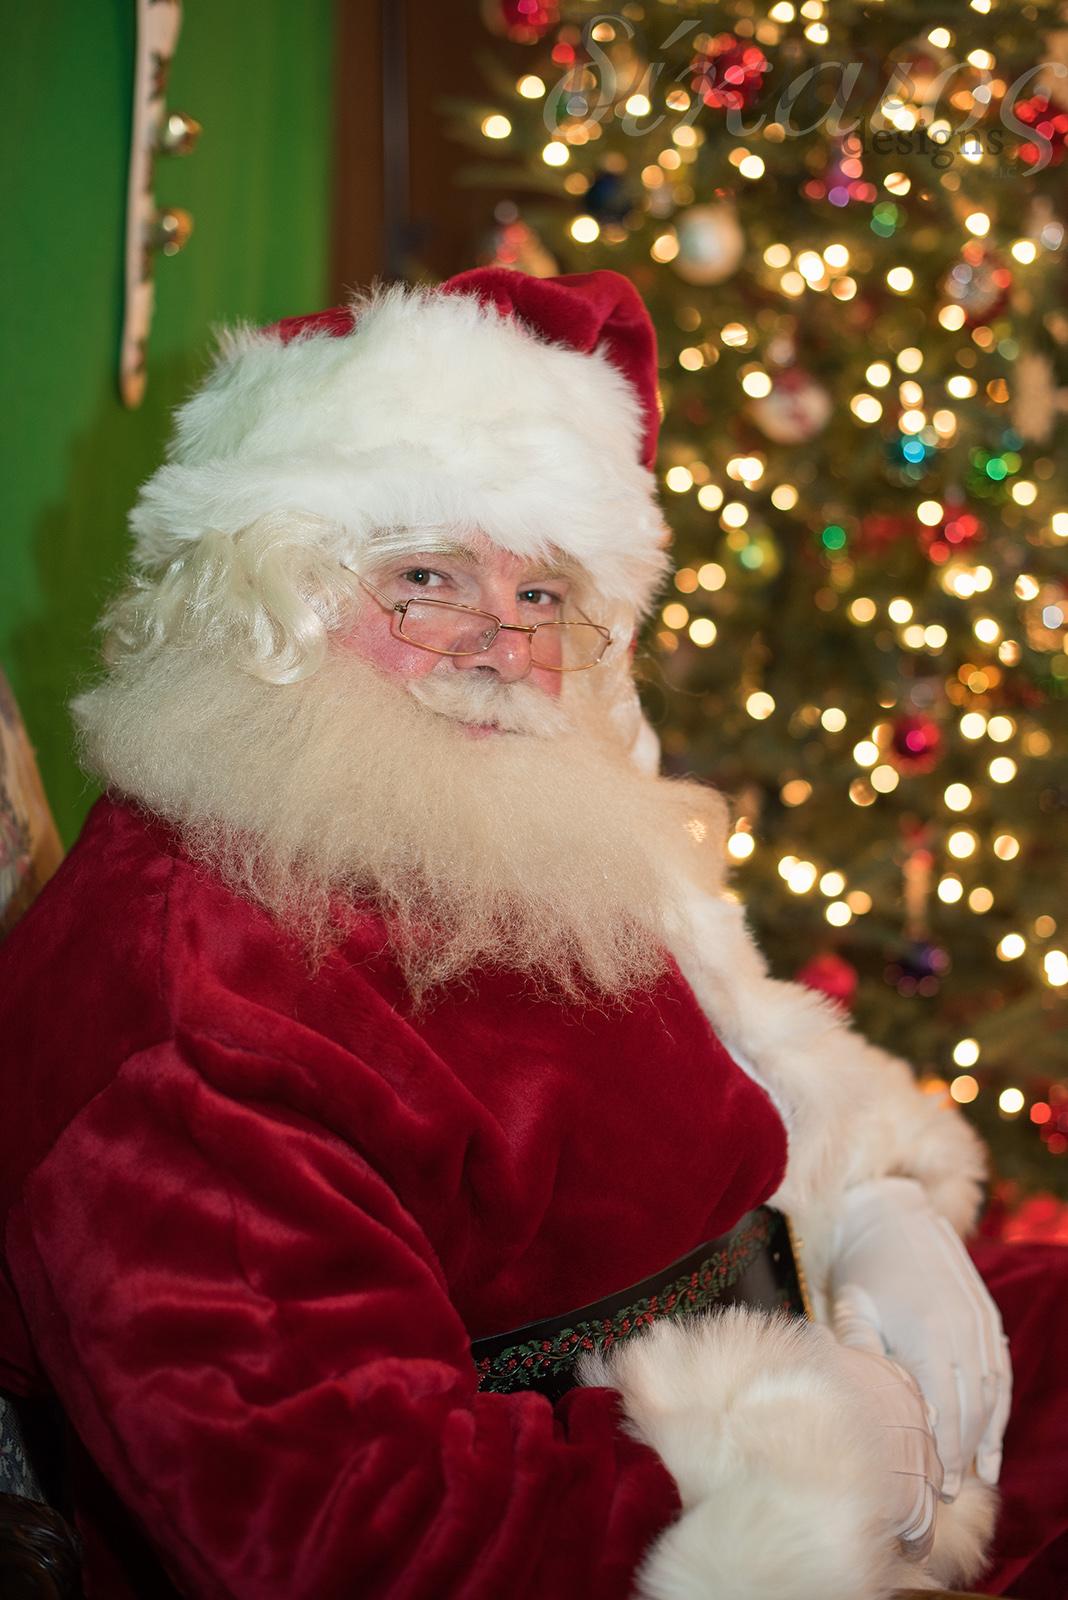 Santa-4277 copy.jpg